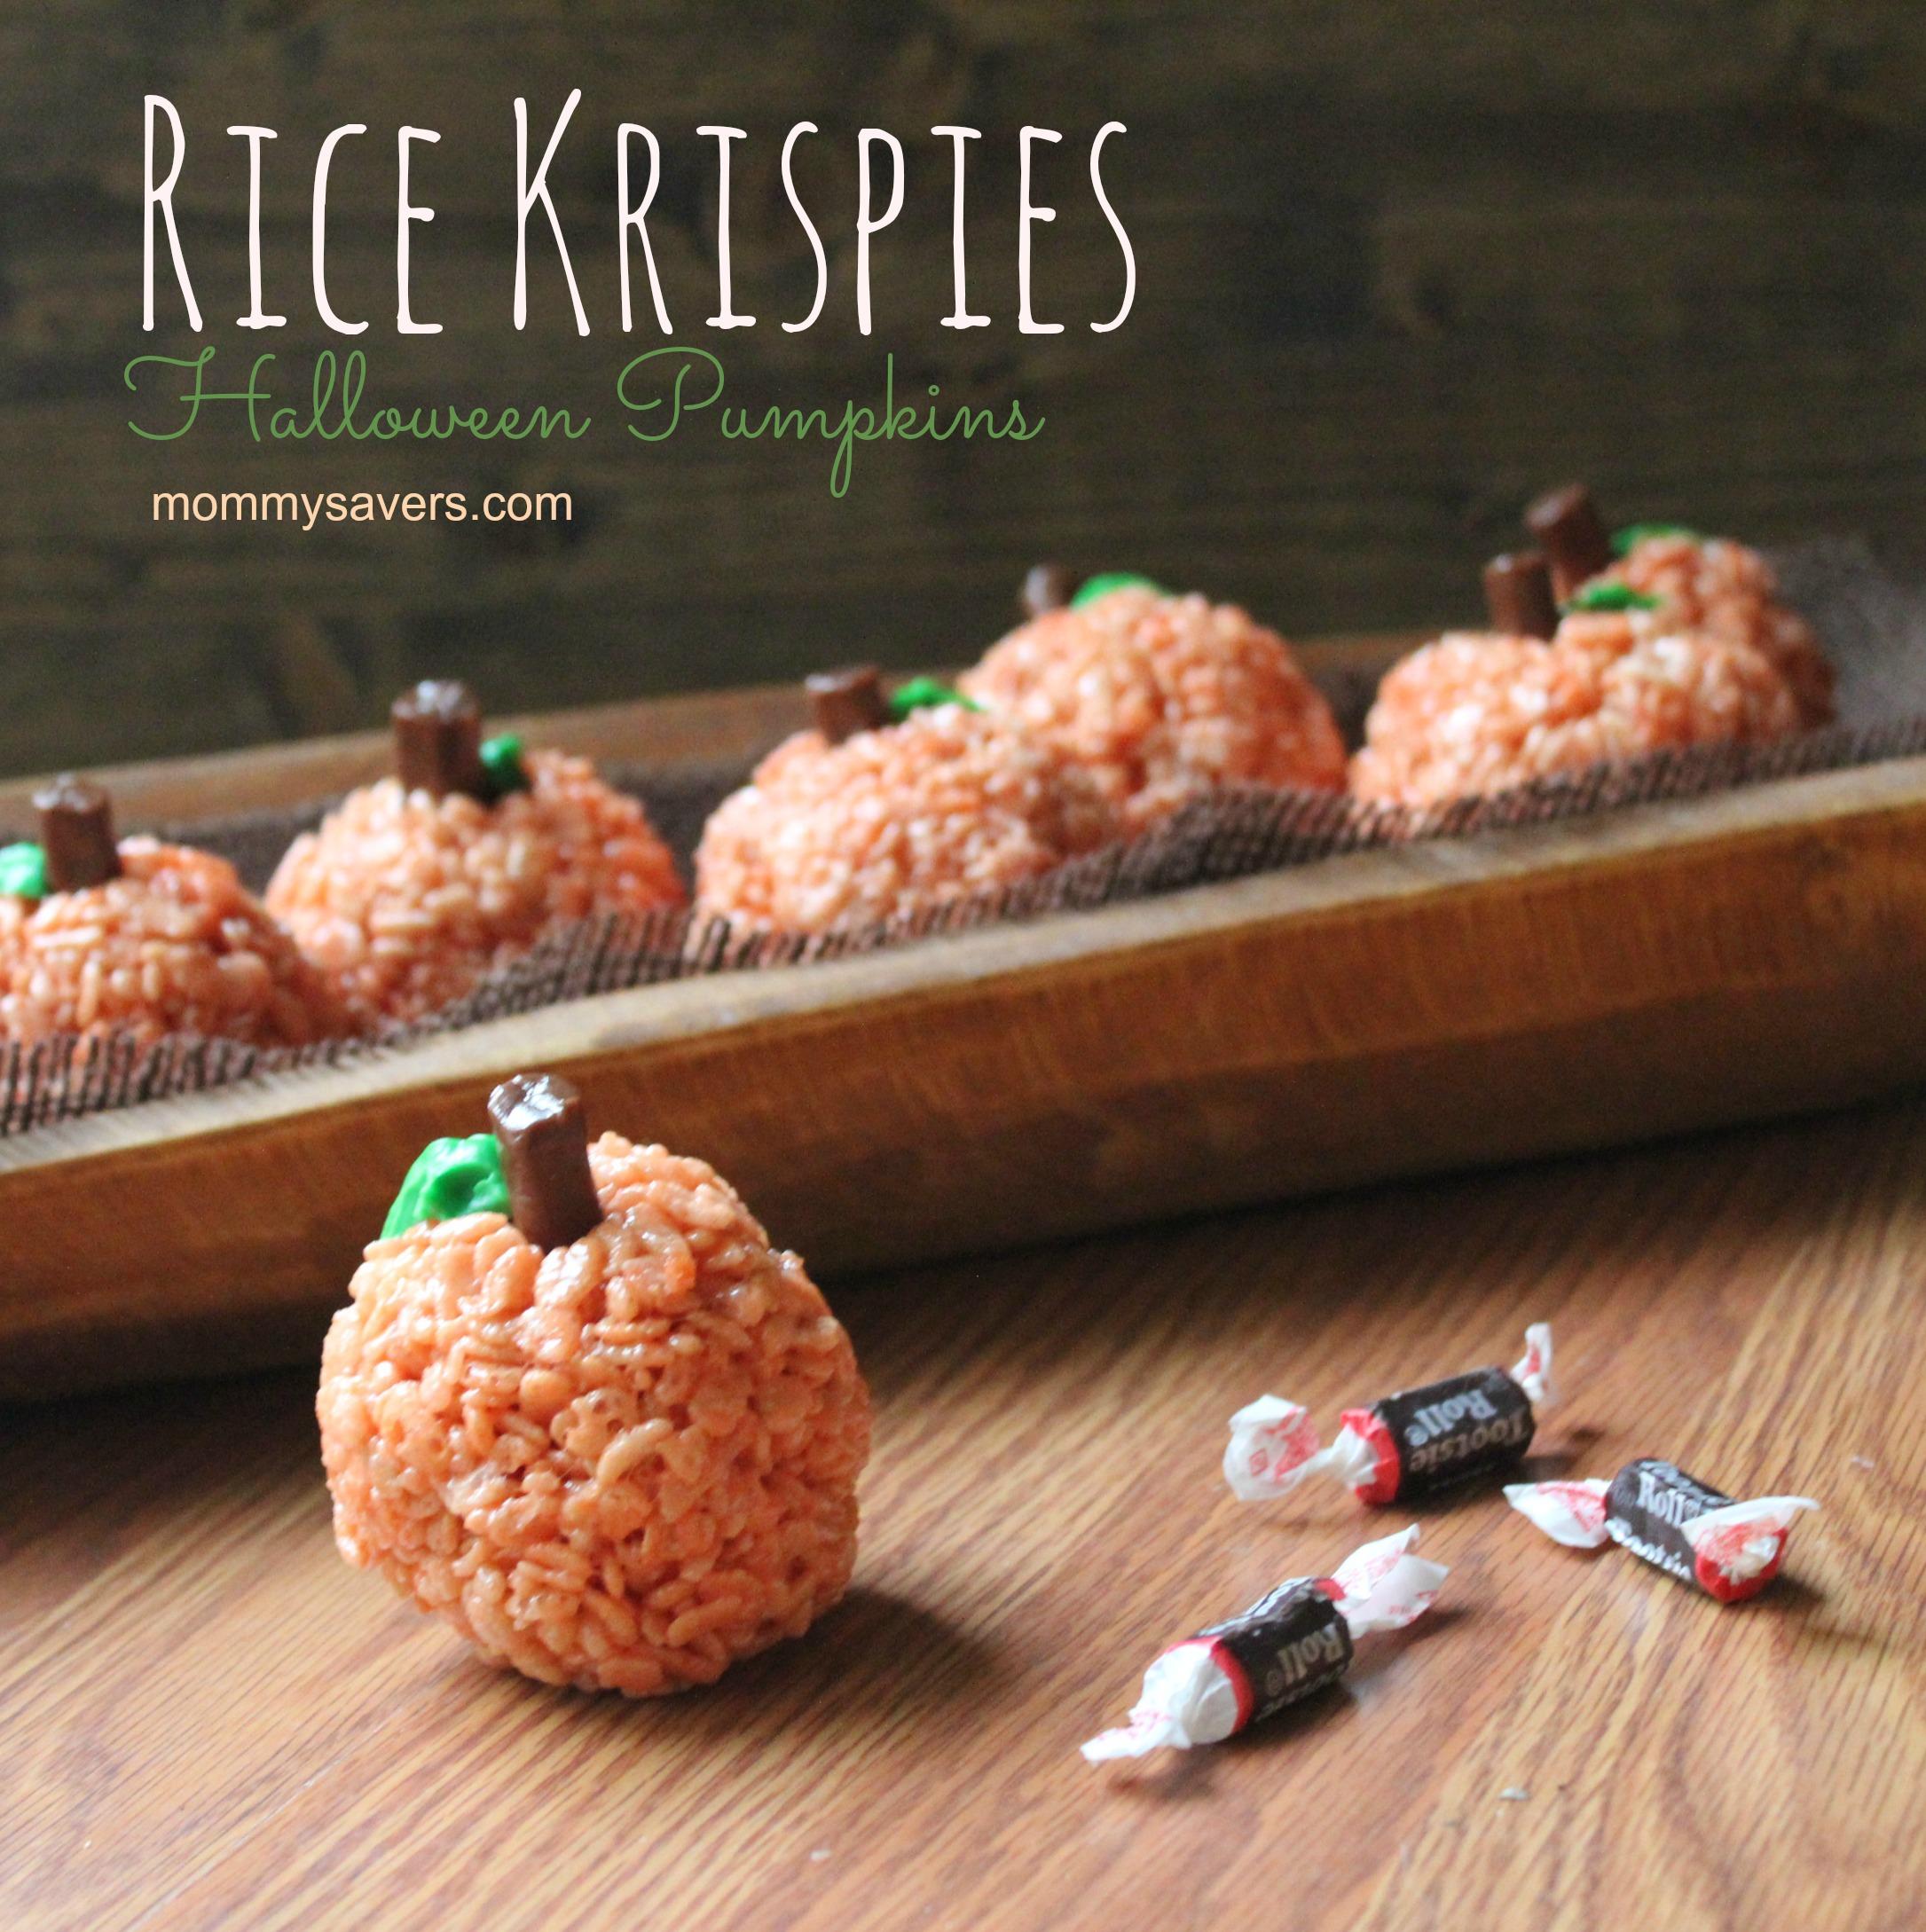 rice krispies halloween pumpkins